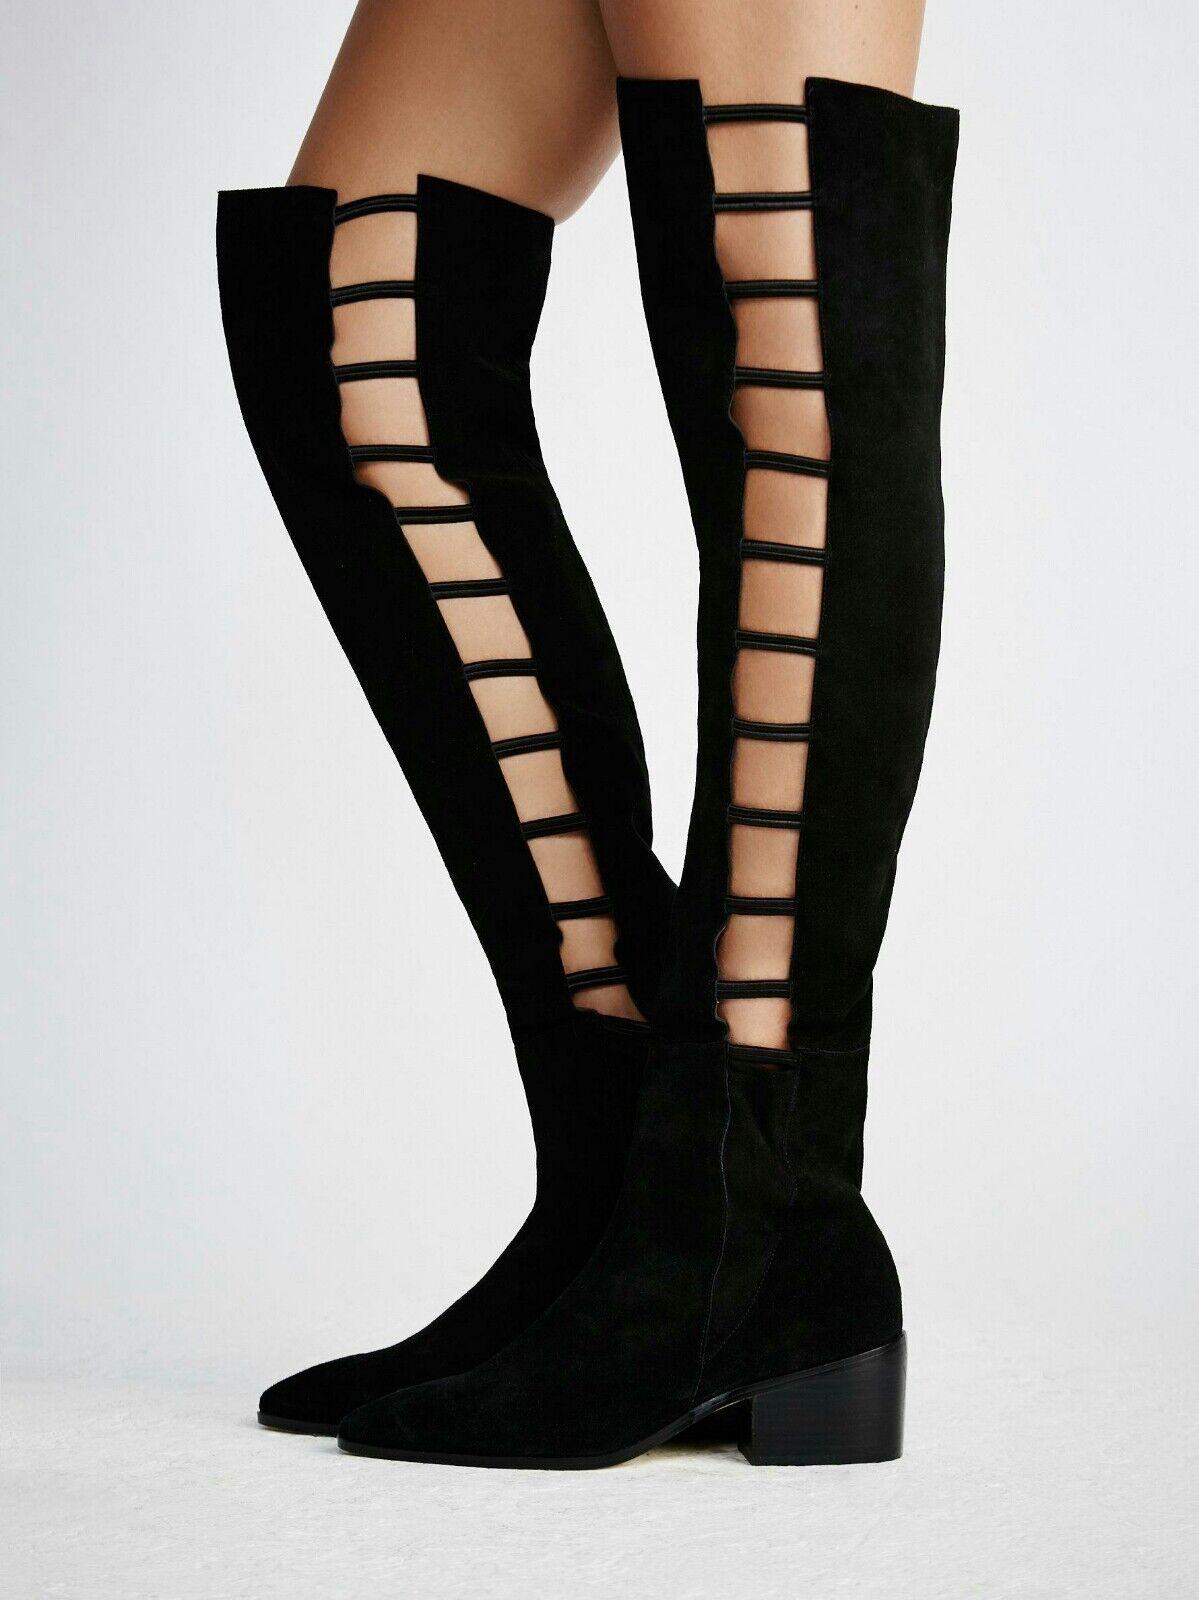 Sito ufficiale Free People Ladder avvio Over the Knee Knee Knee Cutout nero Suede by Farylrobin Sz 9  248  più economico